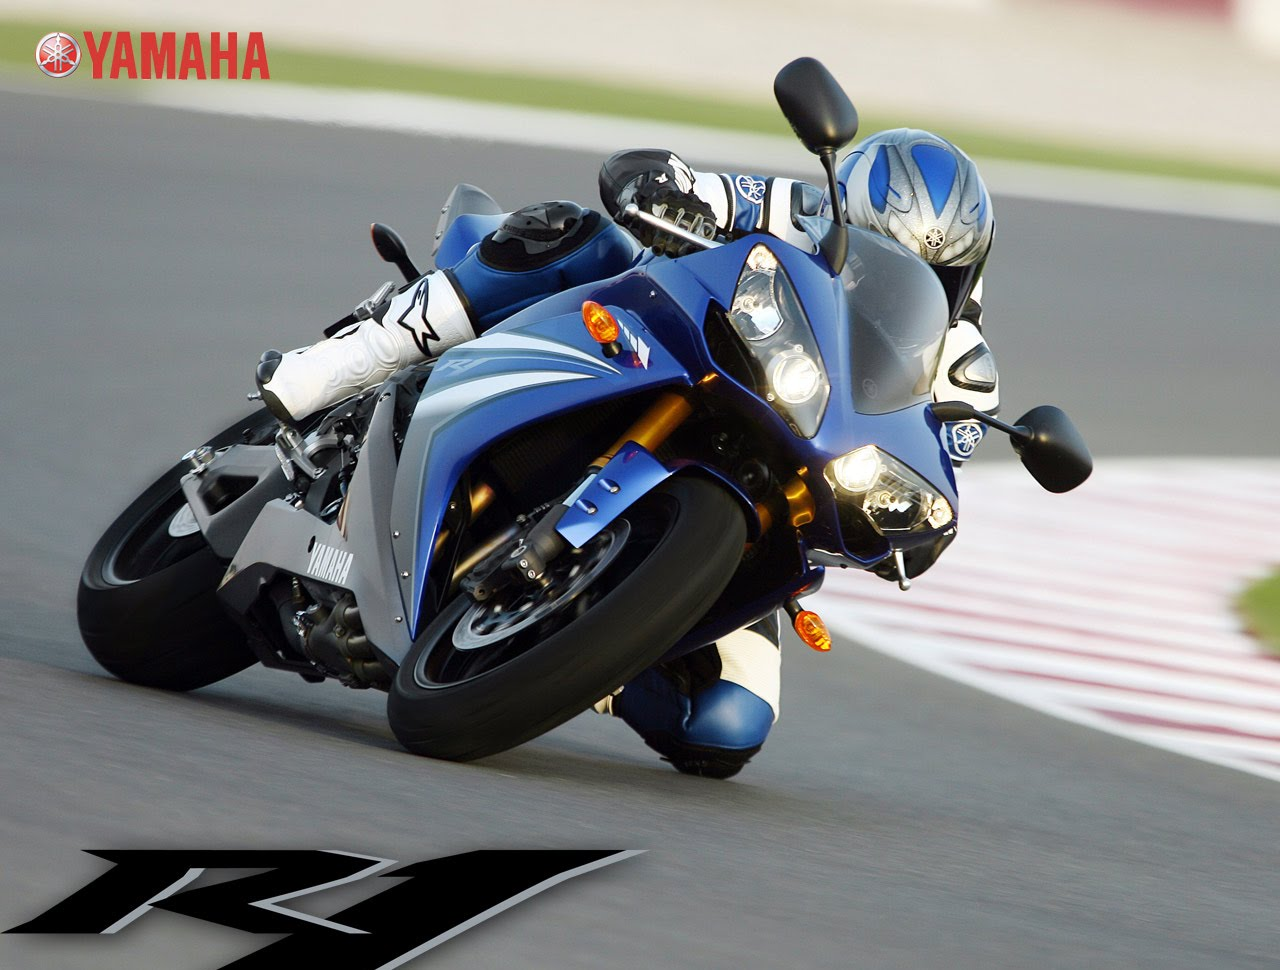 yamaha bike for sale